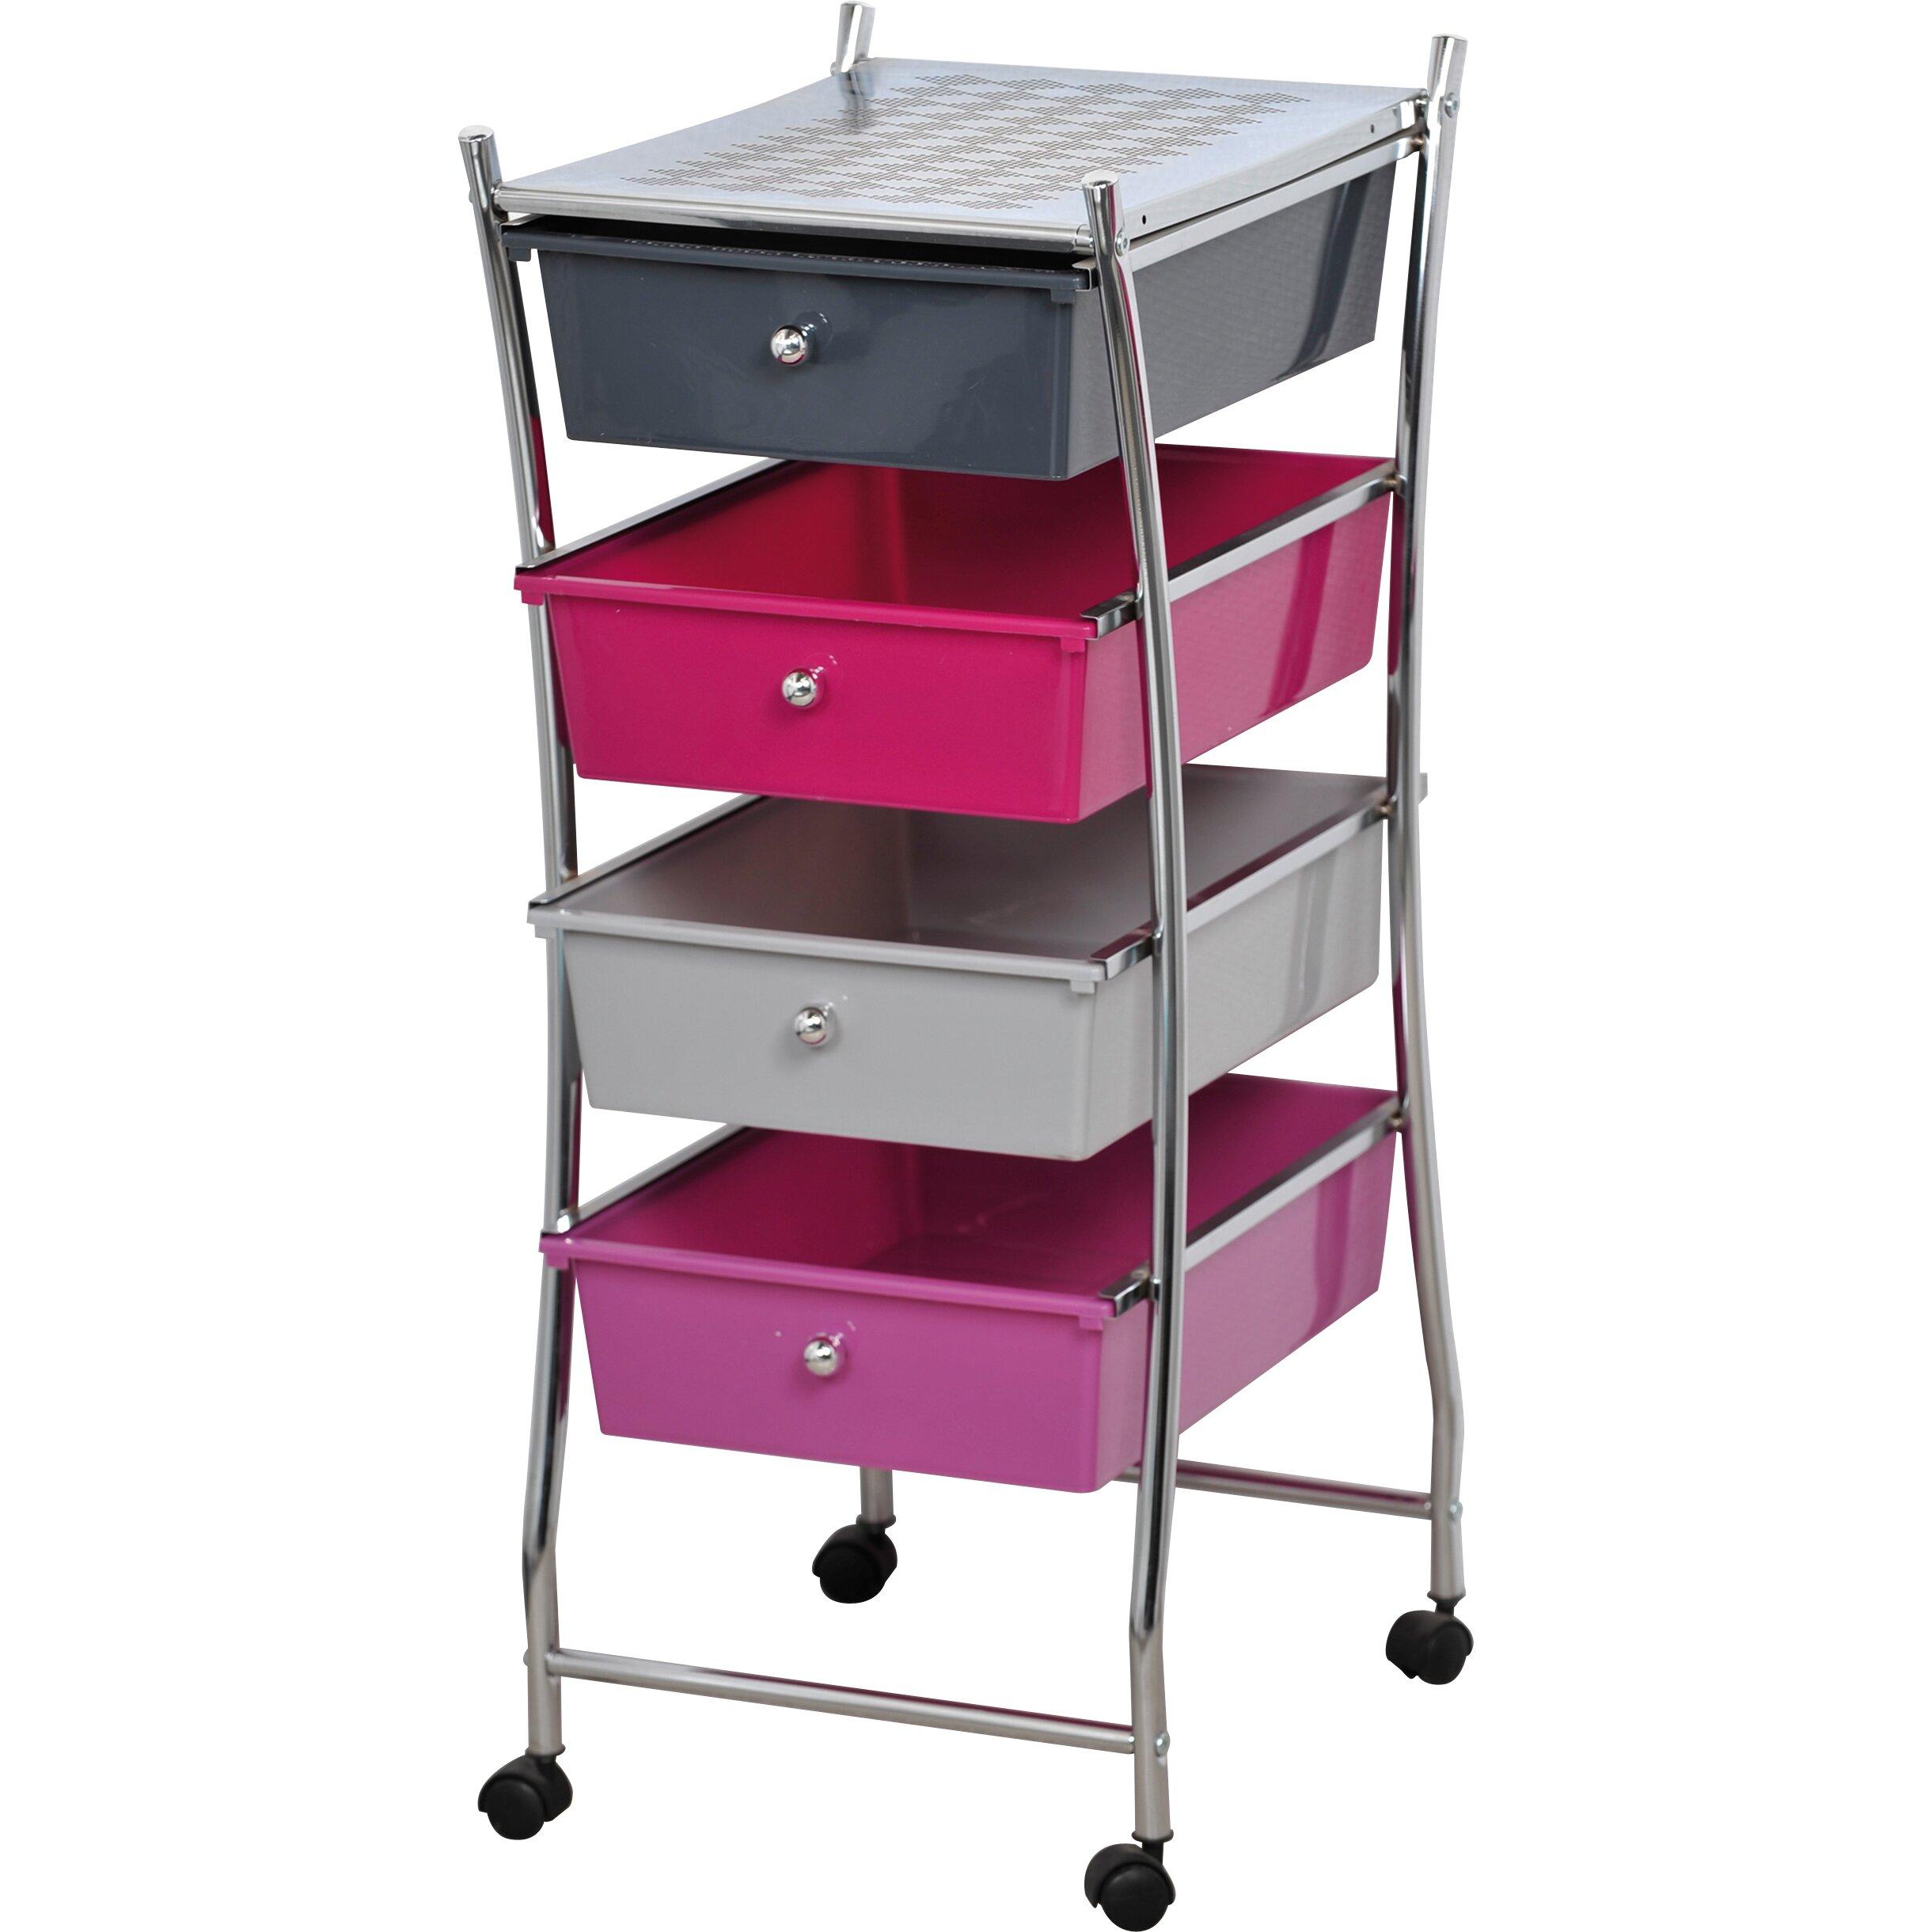 four drawers storage rolling cart wayfair. Black Bedroom Furniture Sets. Home Design Ideas